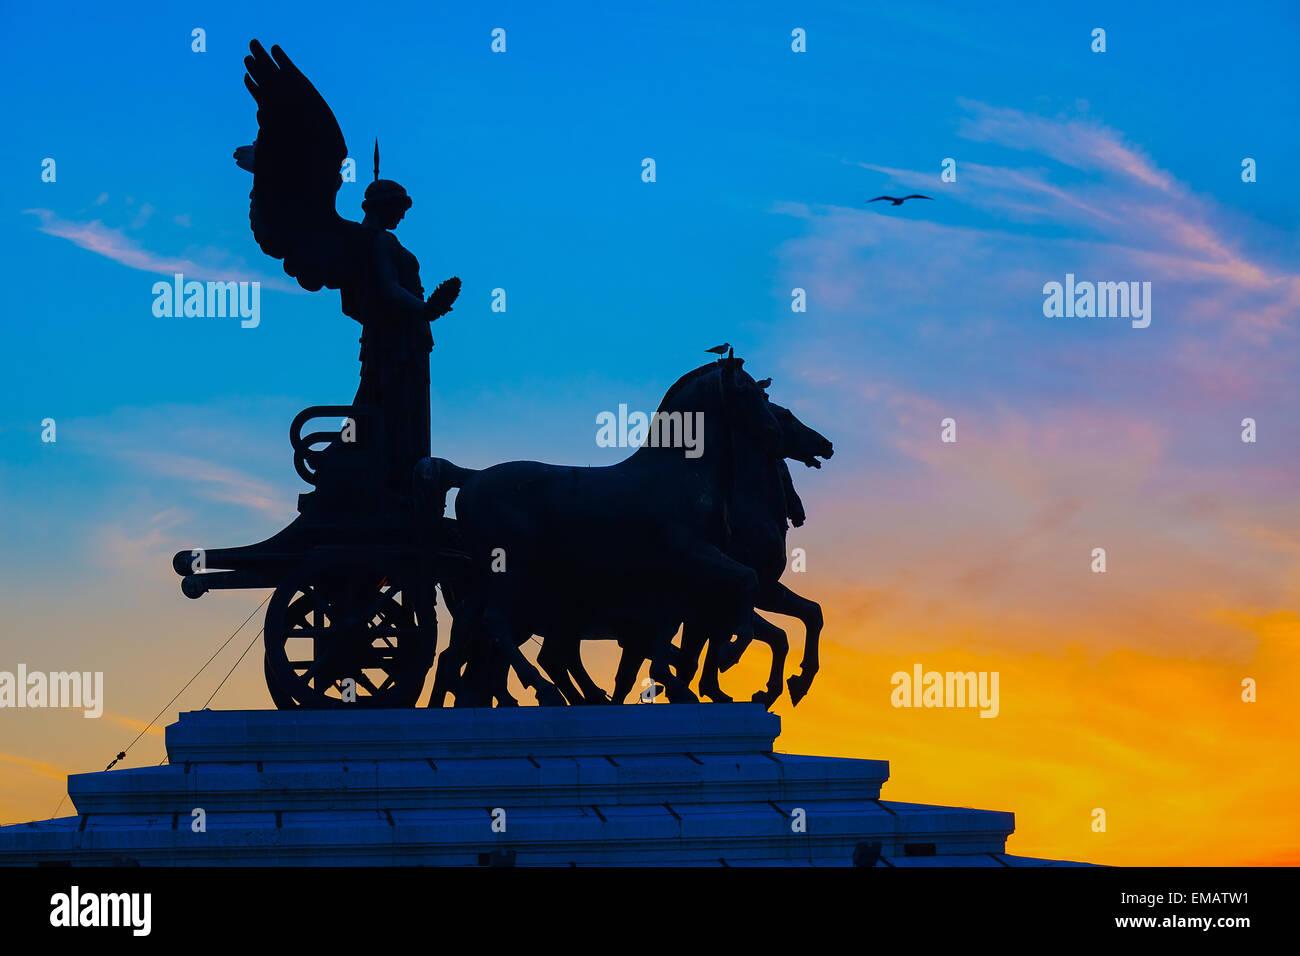 Goddess Victoria riding on quadriga, Rome - Stock Image